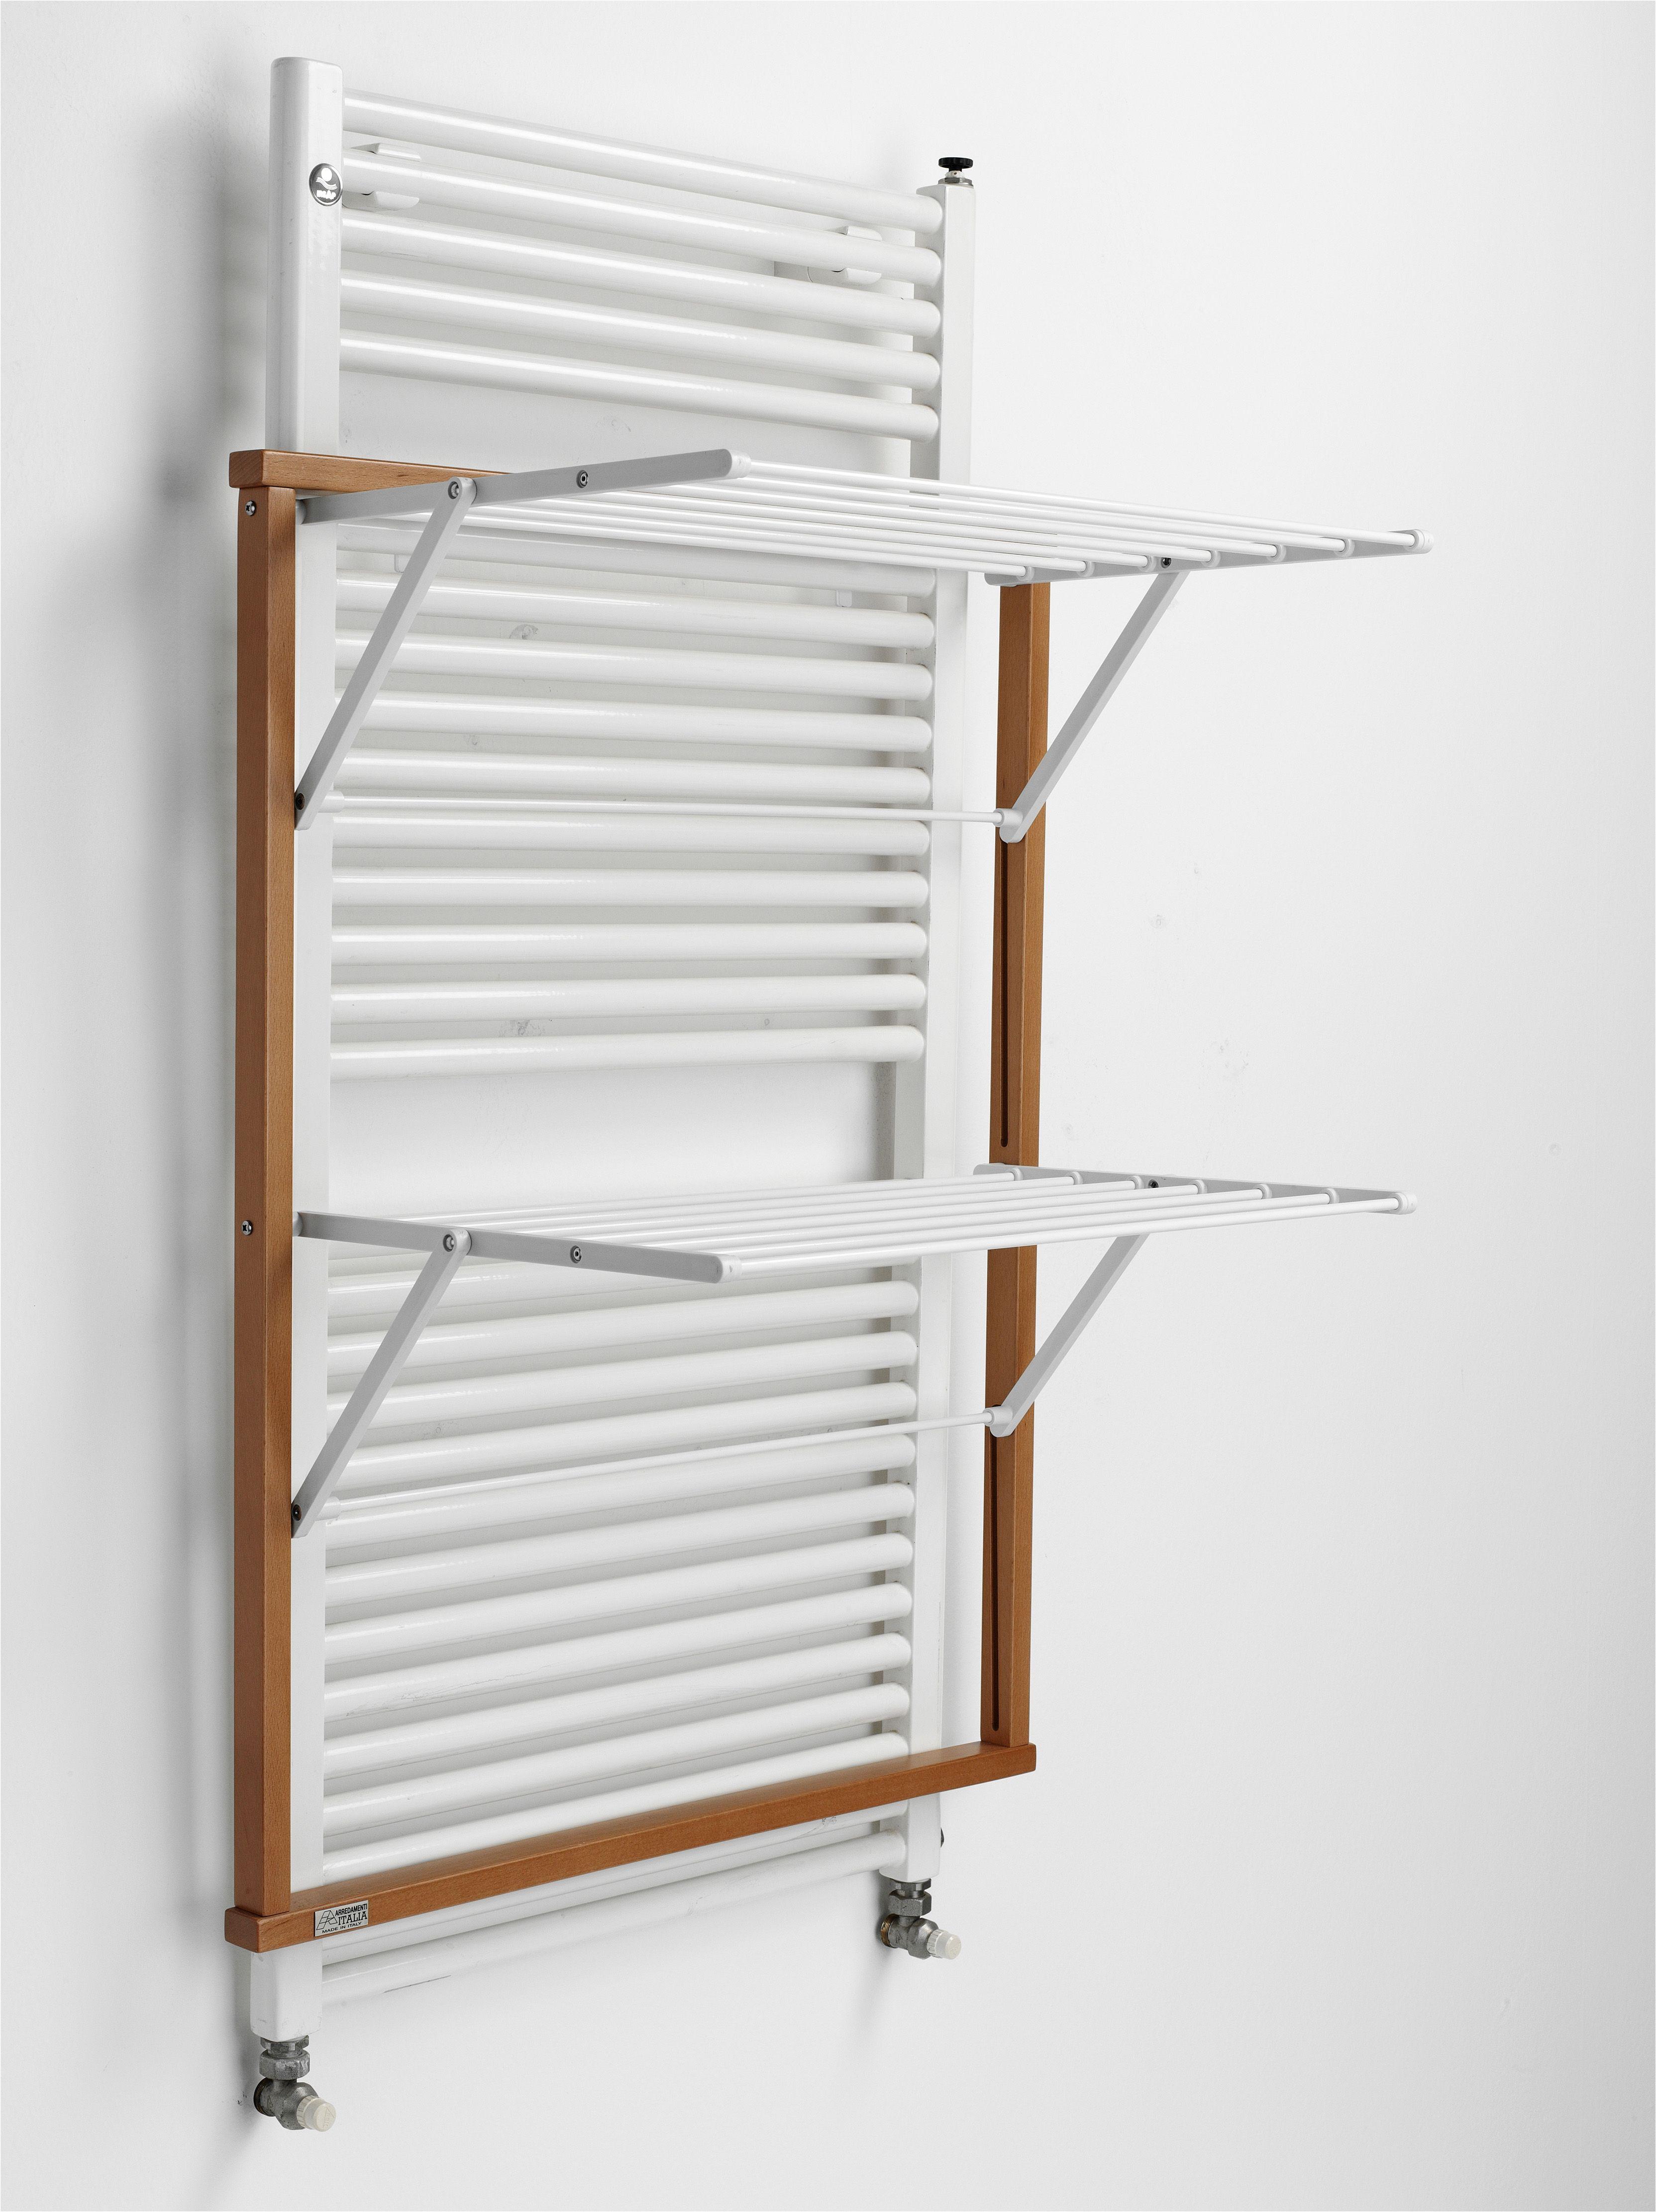 w schest nder mit buchenholzrahmen f r wandheizk rper laundry rack with beechwood frame for. Black Bedroom Furniture Sets. Home Design Ideas